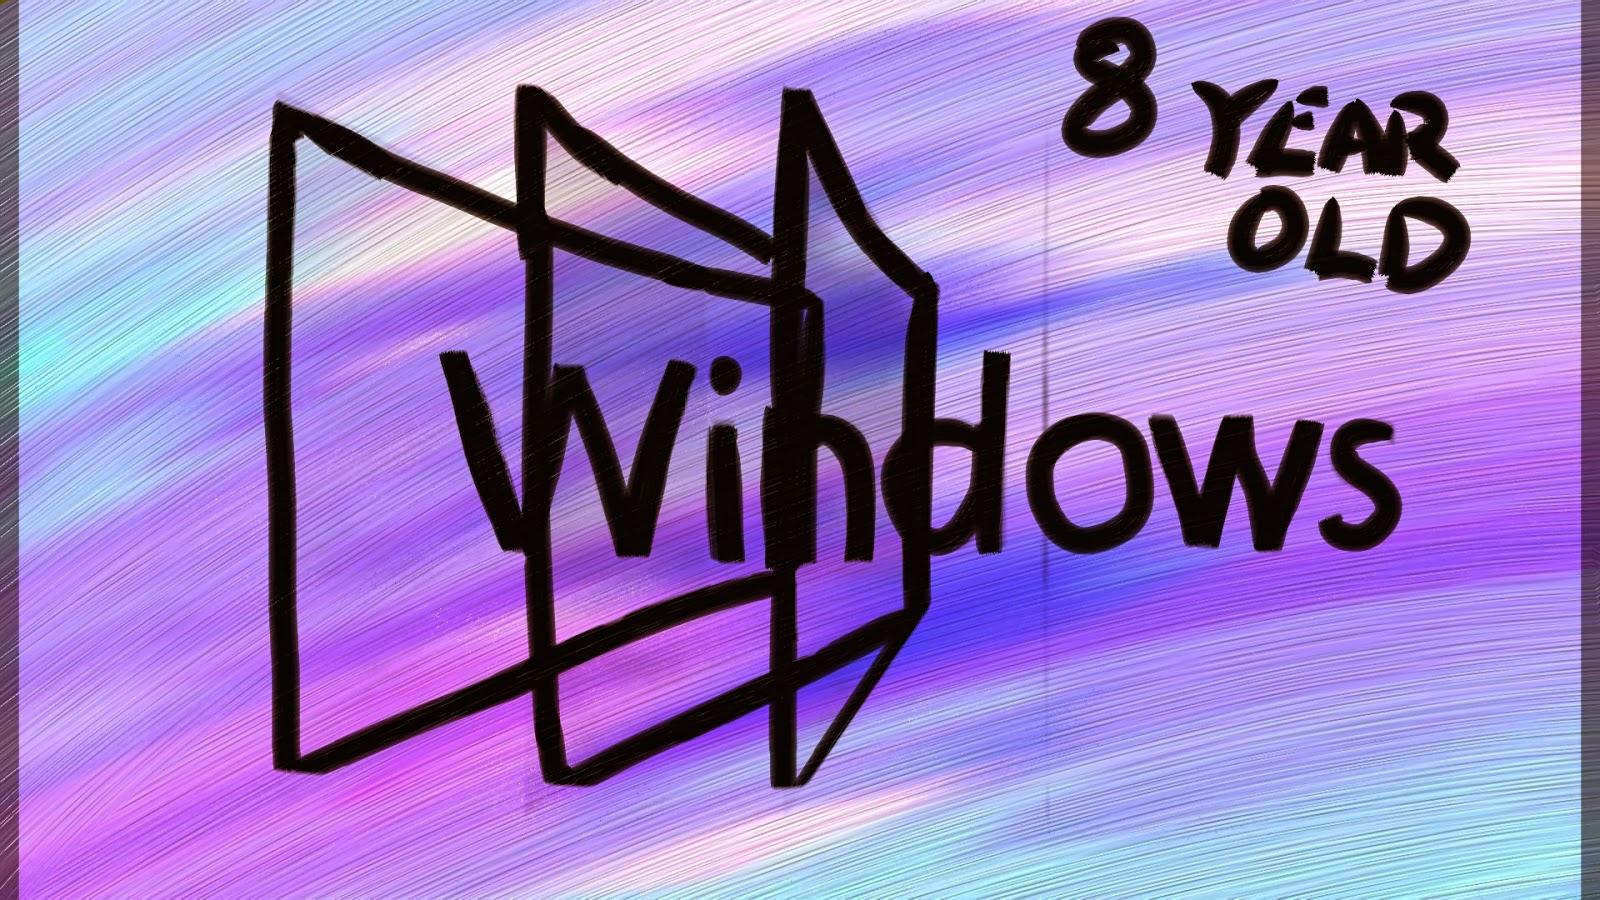 Windows 8 by an 8 Year Old Wallpaper Art